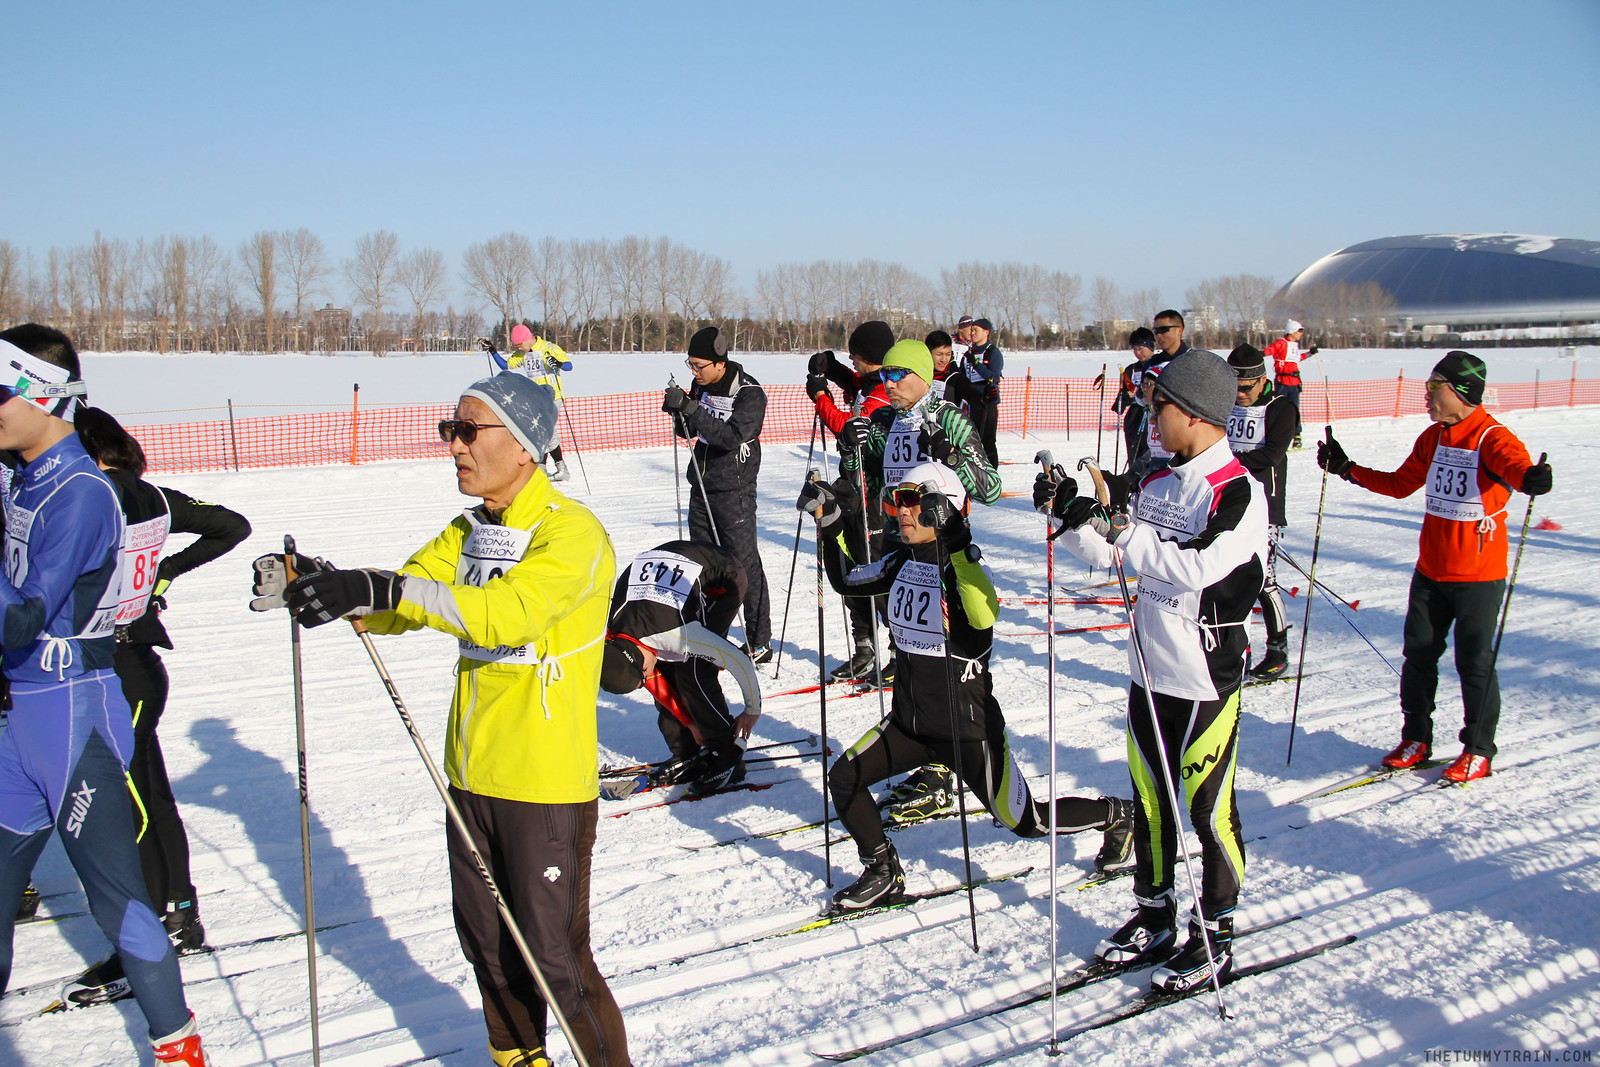 32793110151 4a6209ca65 h - Sapporo Snow And Smile: 8 Unforgettable Winter Experiences in Sapporo City